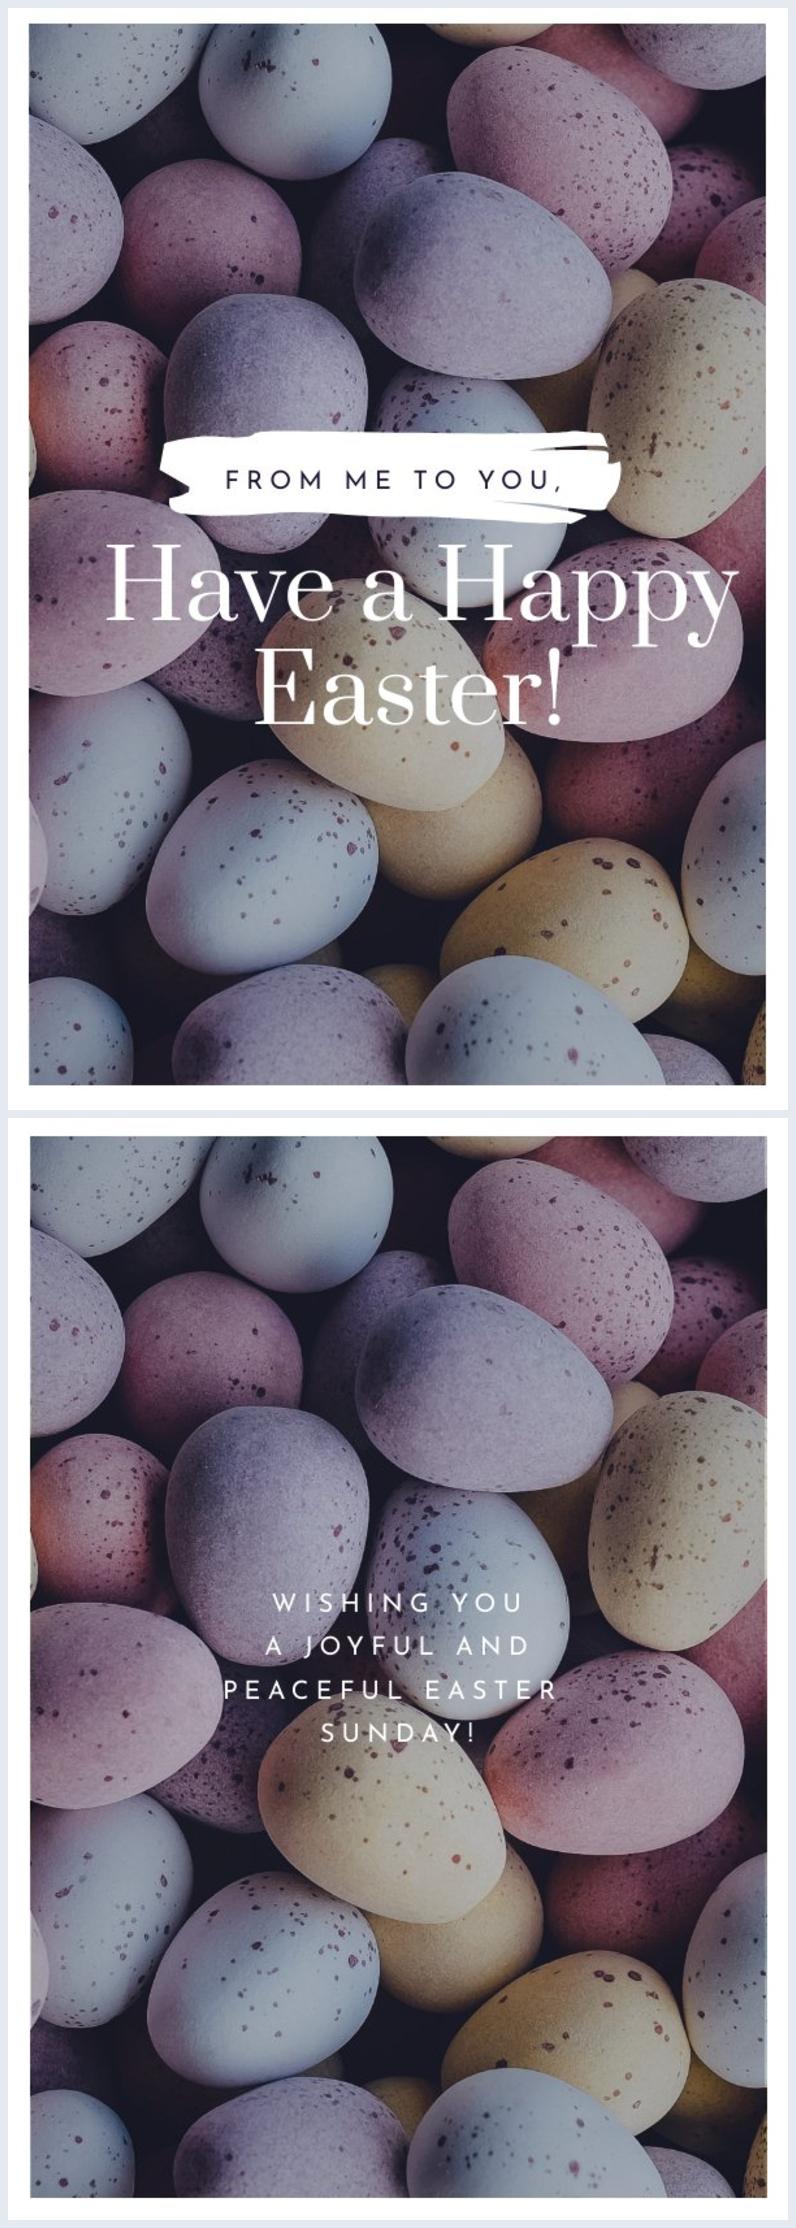 Easter Egg Card Template